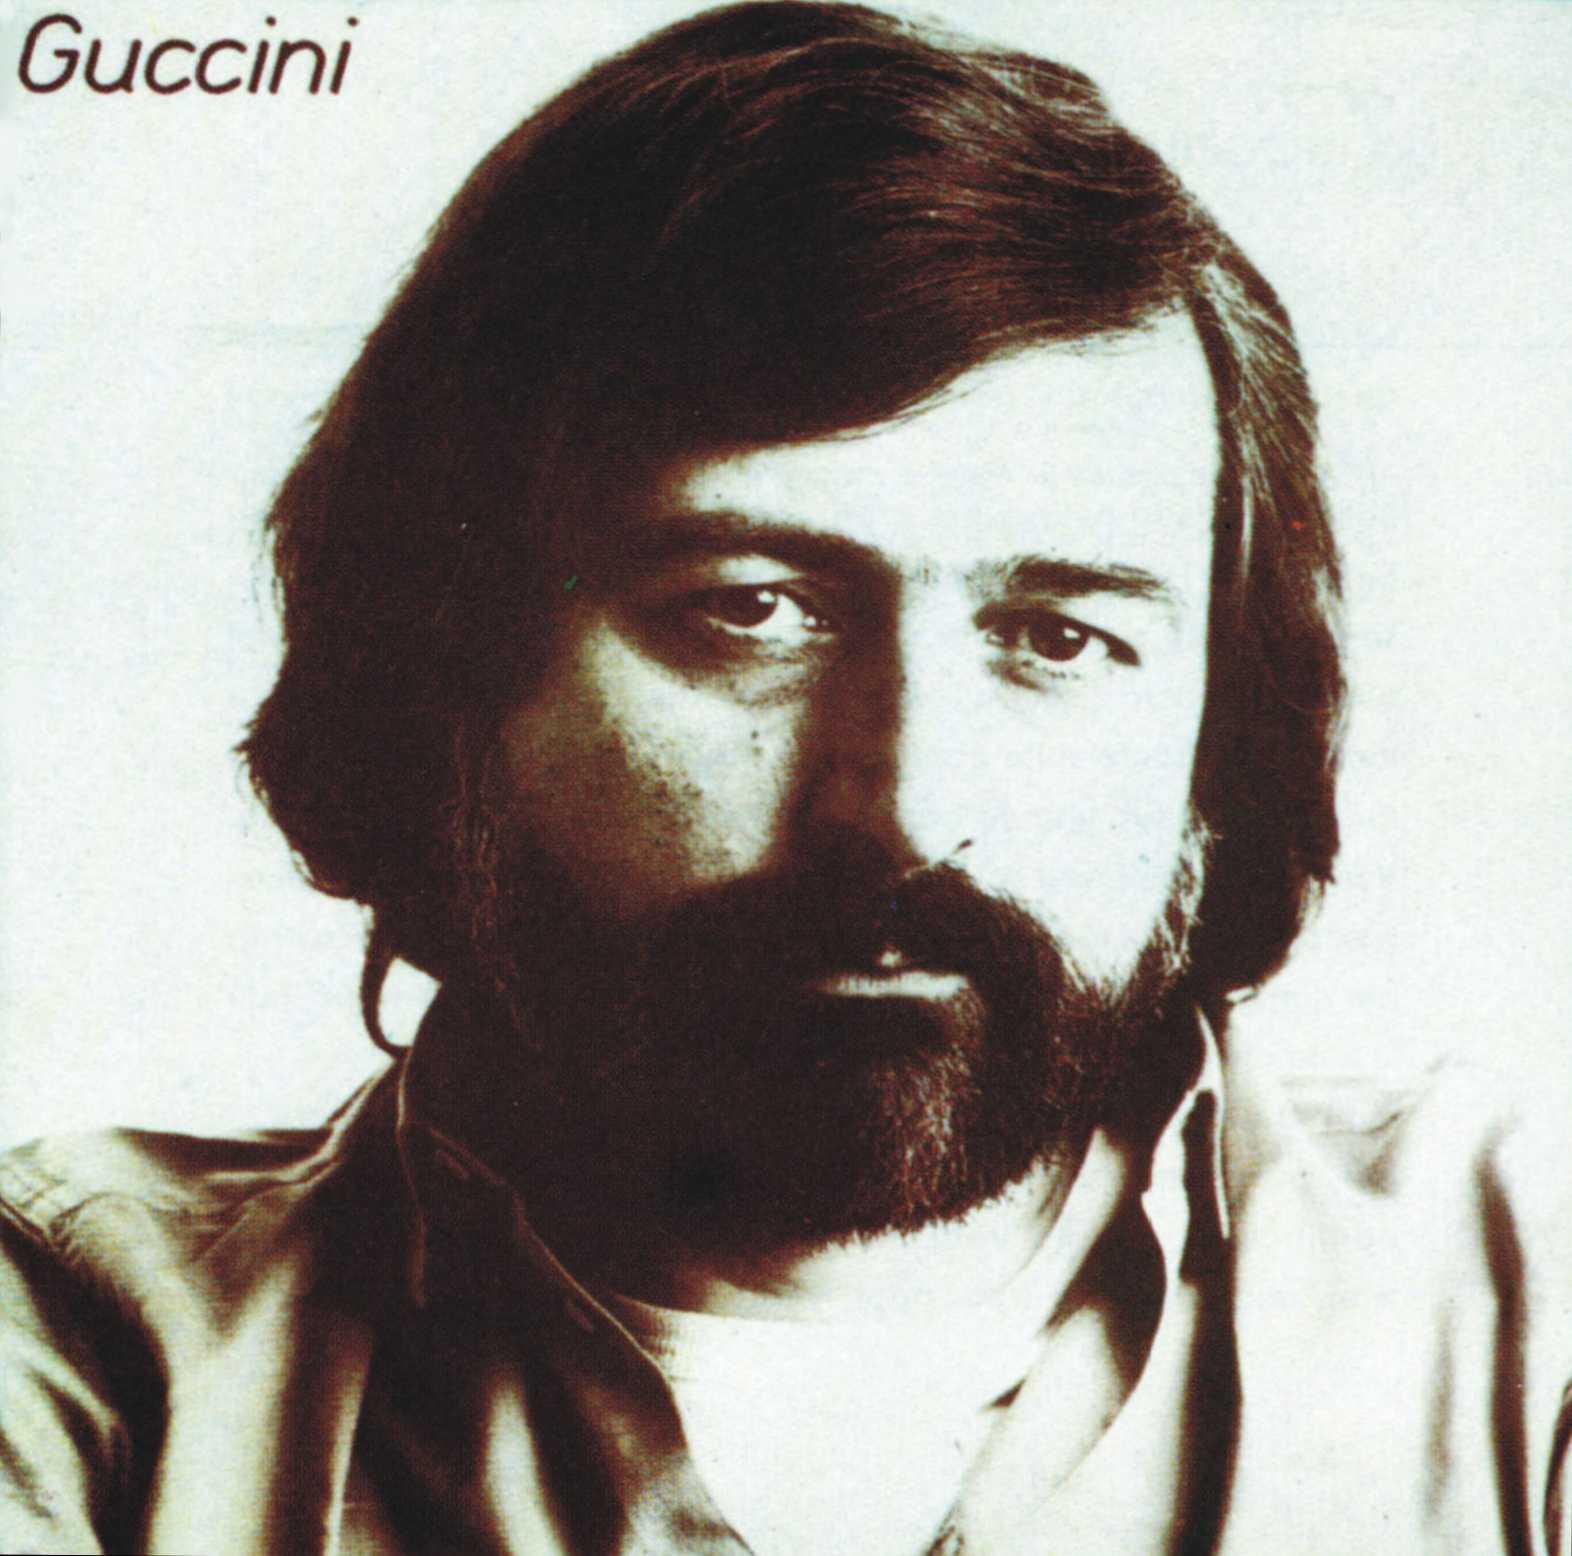 Copertina Disco Vinile 33 giri Guccini di Francesco Guccini